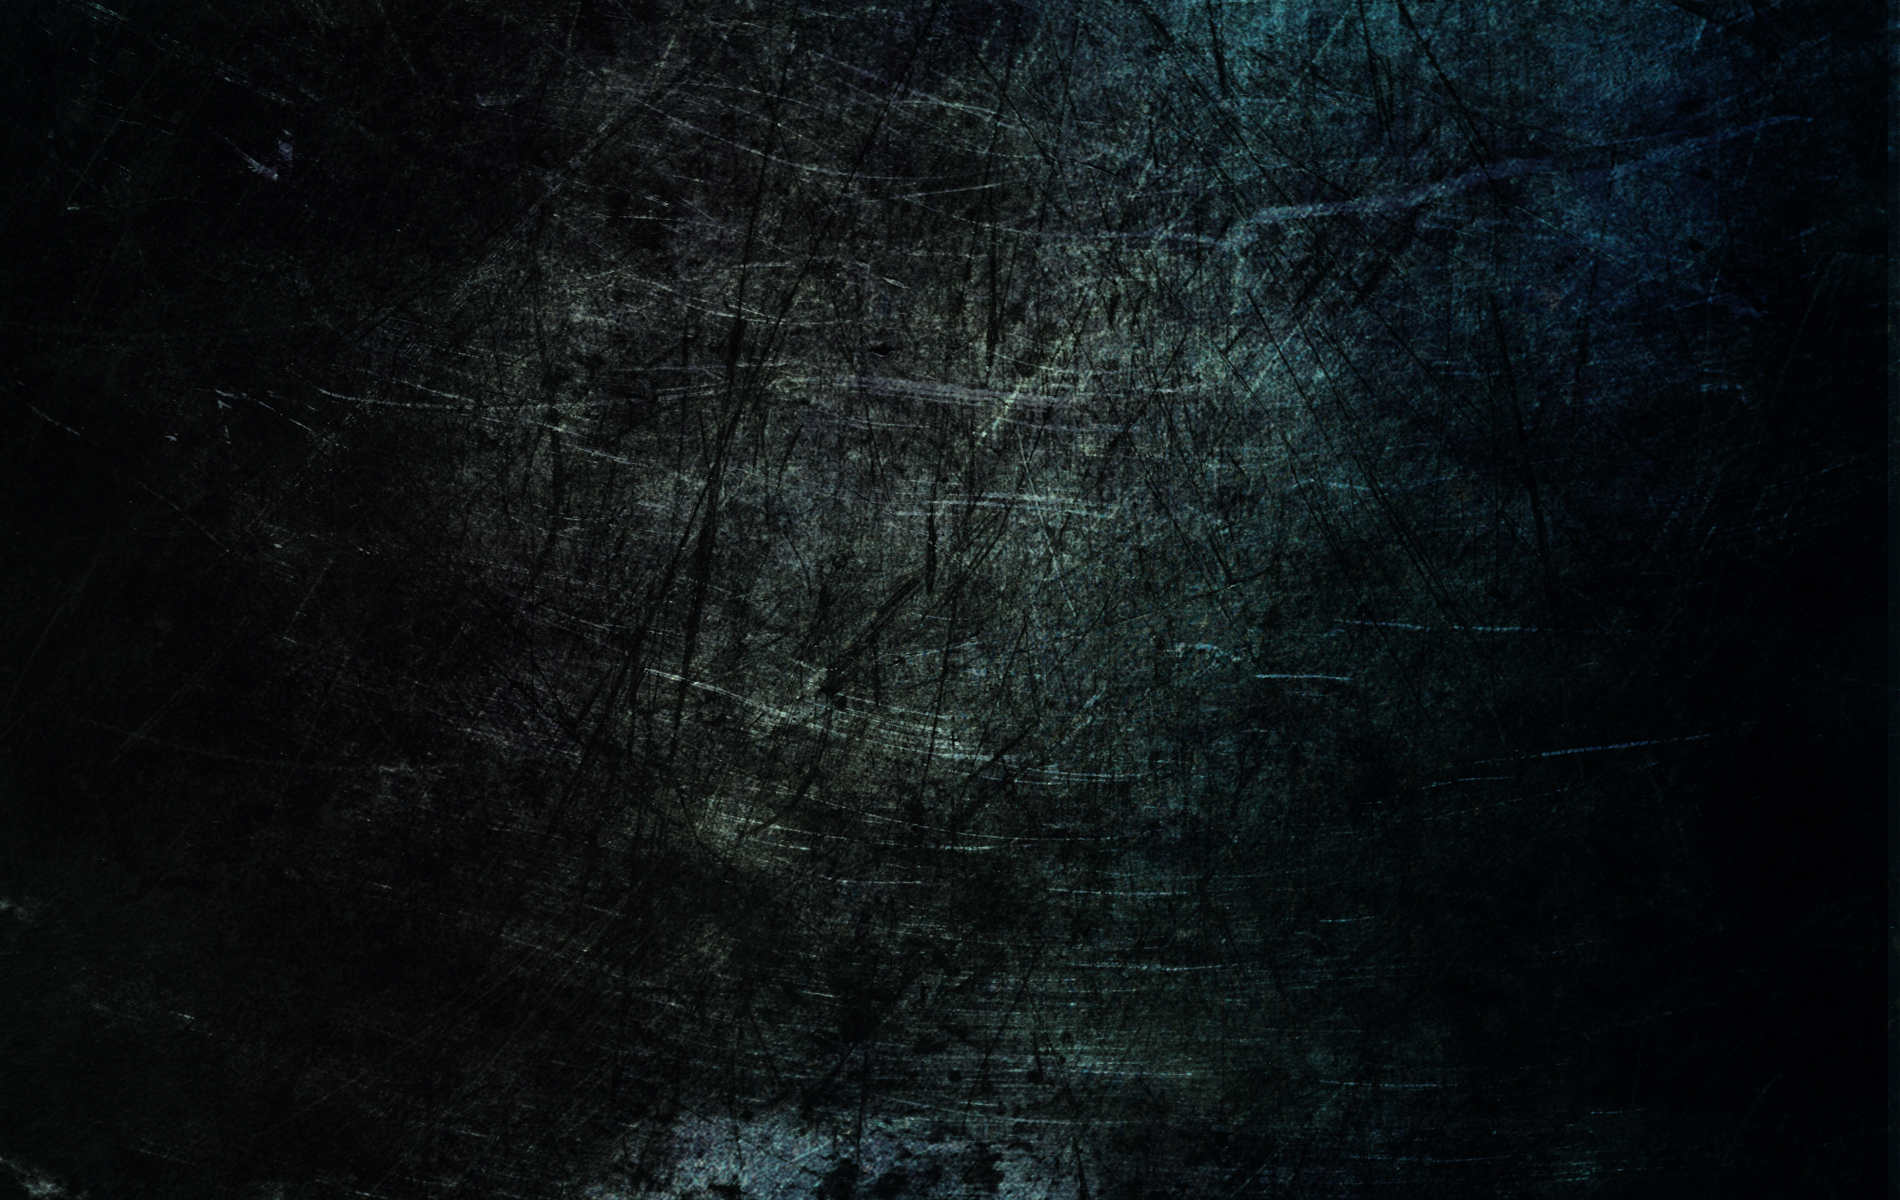 Sctexturedarkandblue Sup Wallpaper 1900x1200 Sctexturedarkandblue Sup 1900x1200